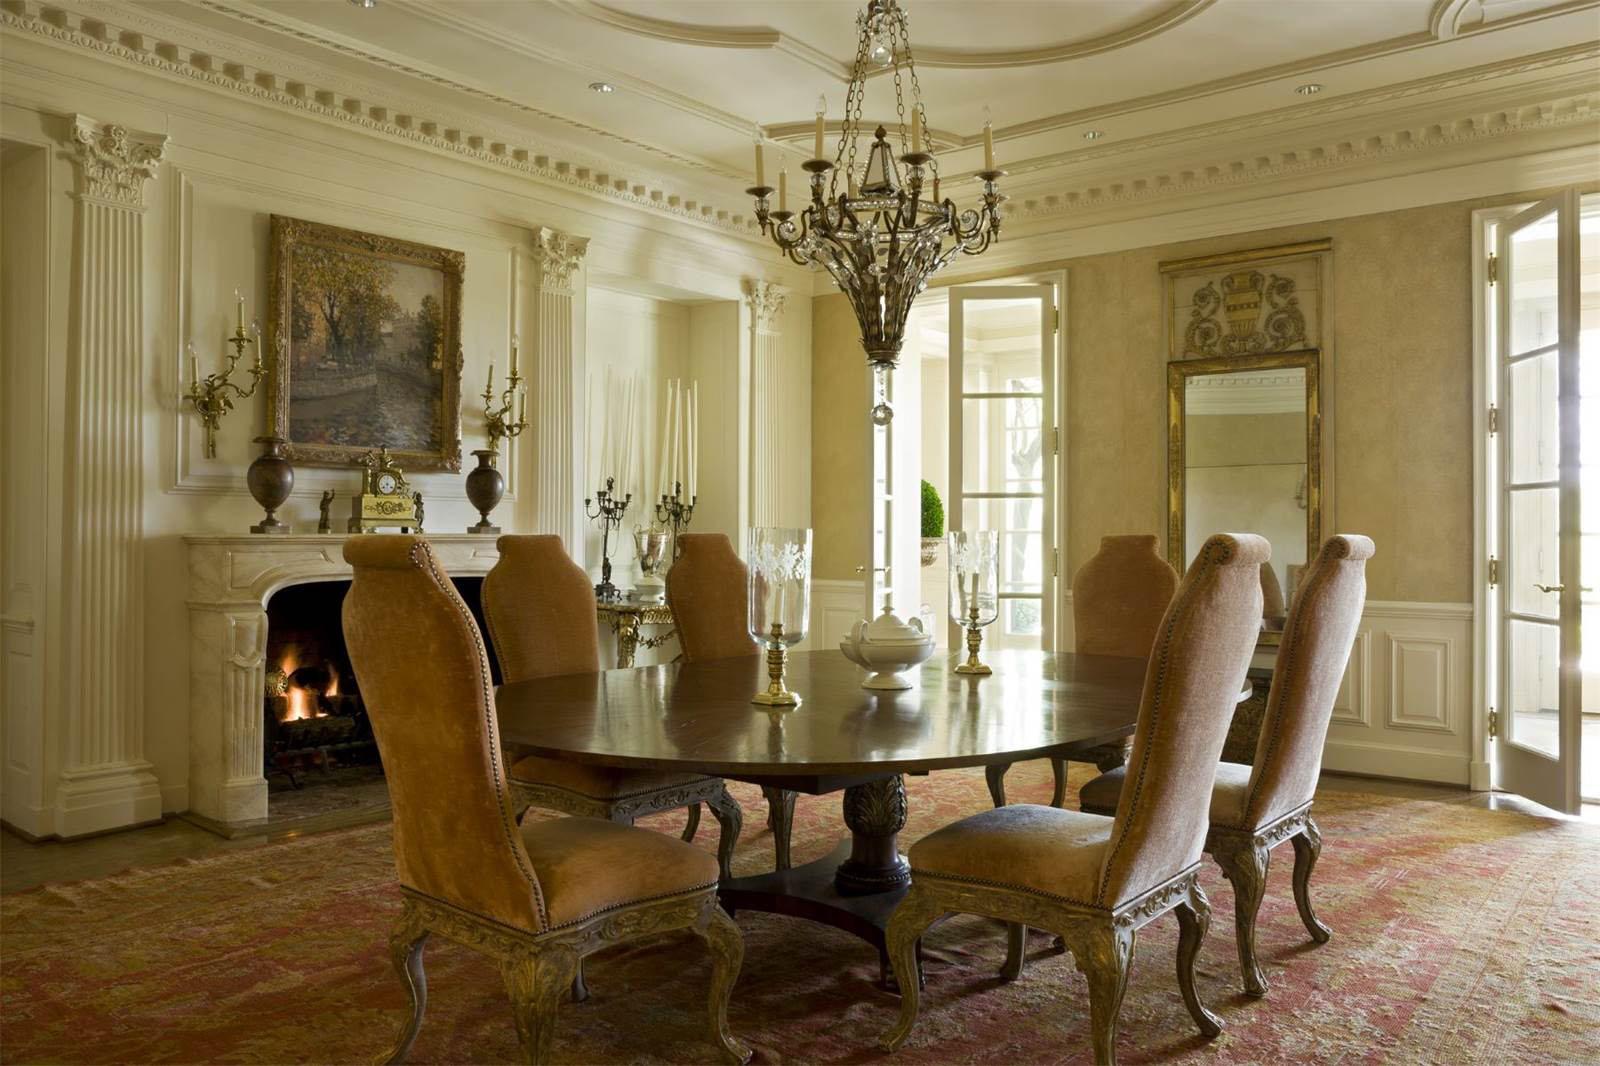 Jacqueline-Kennedy-Onassis-Childhood-Home-Merrywood-McLean-Virginia_4